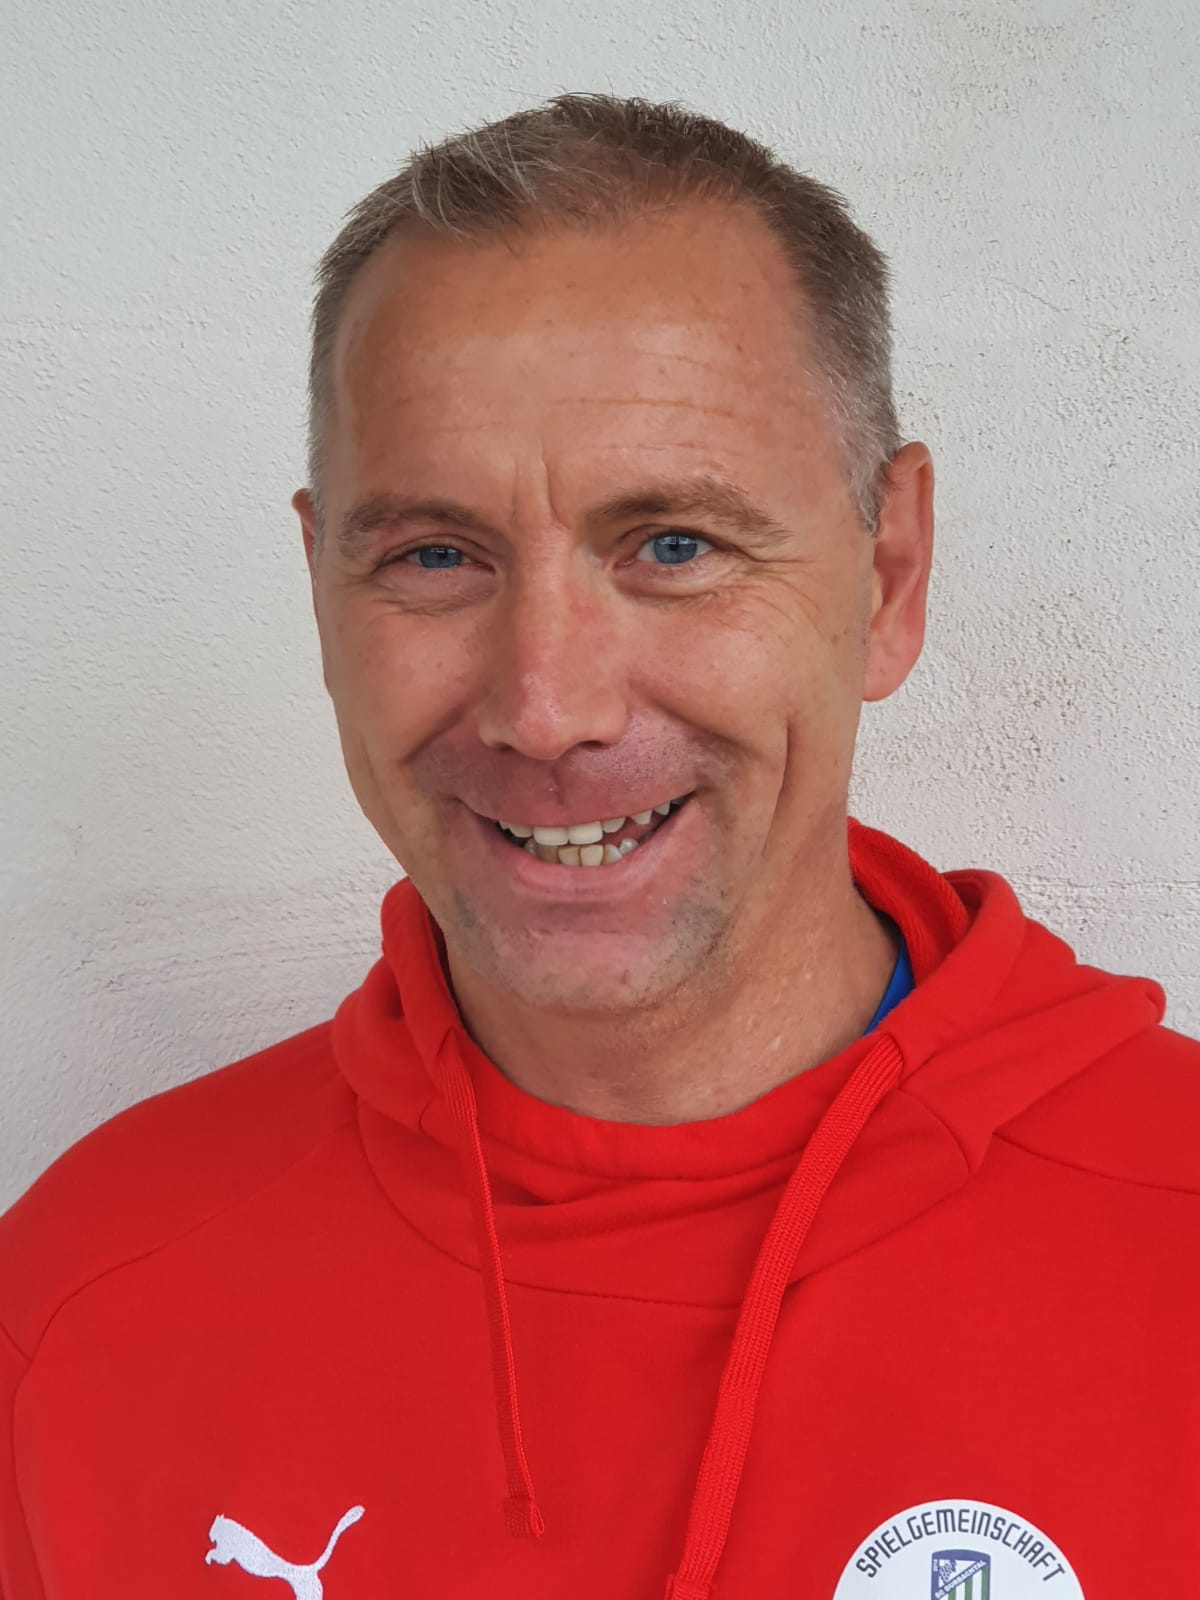 Michael Landsdorfer